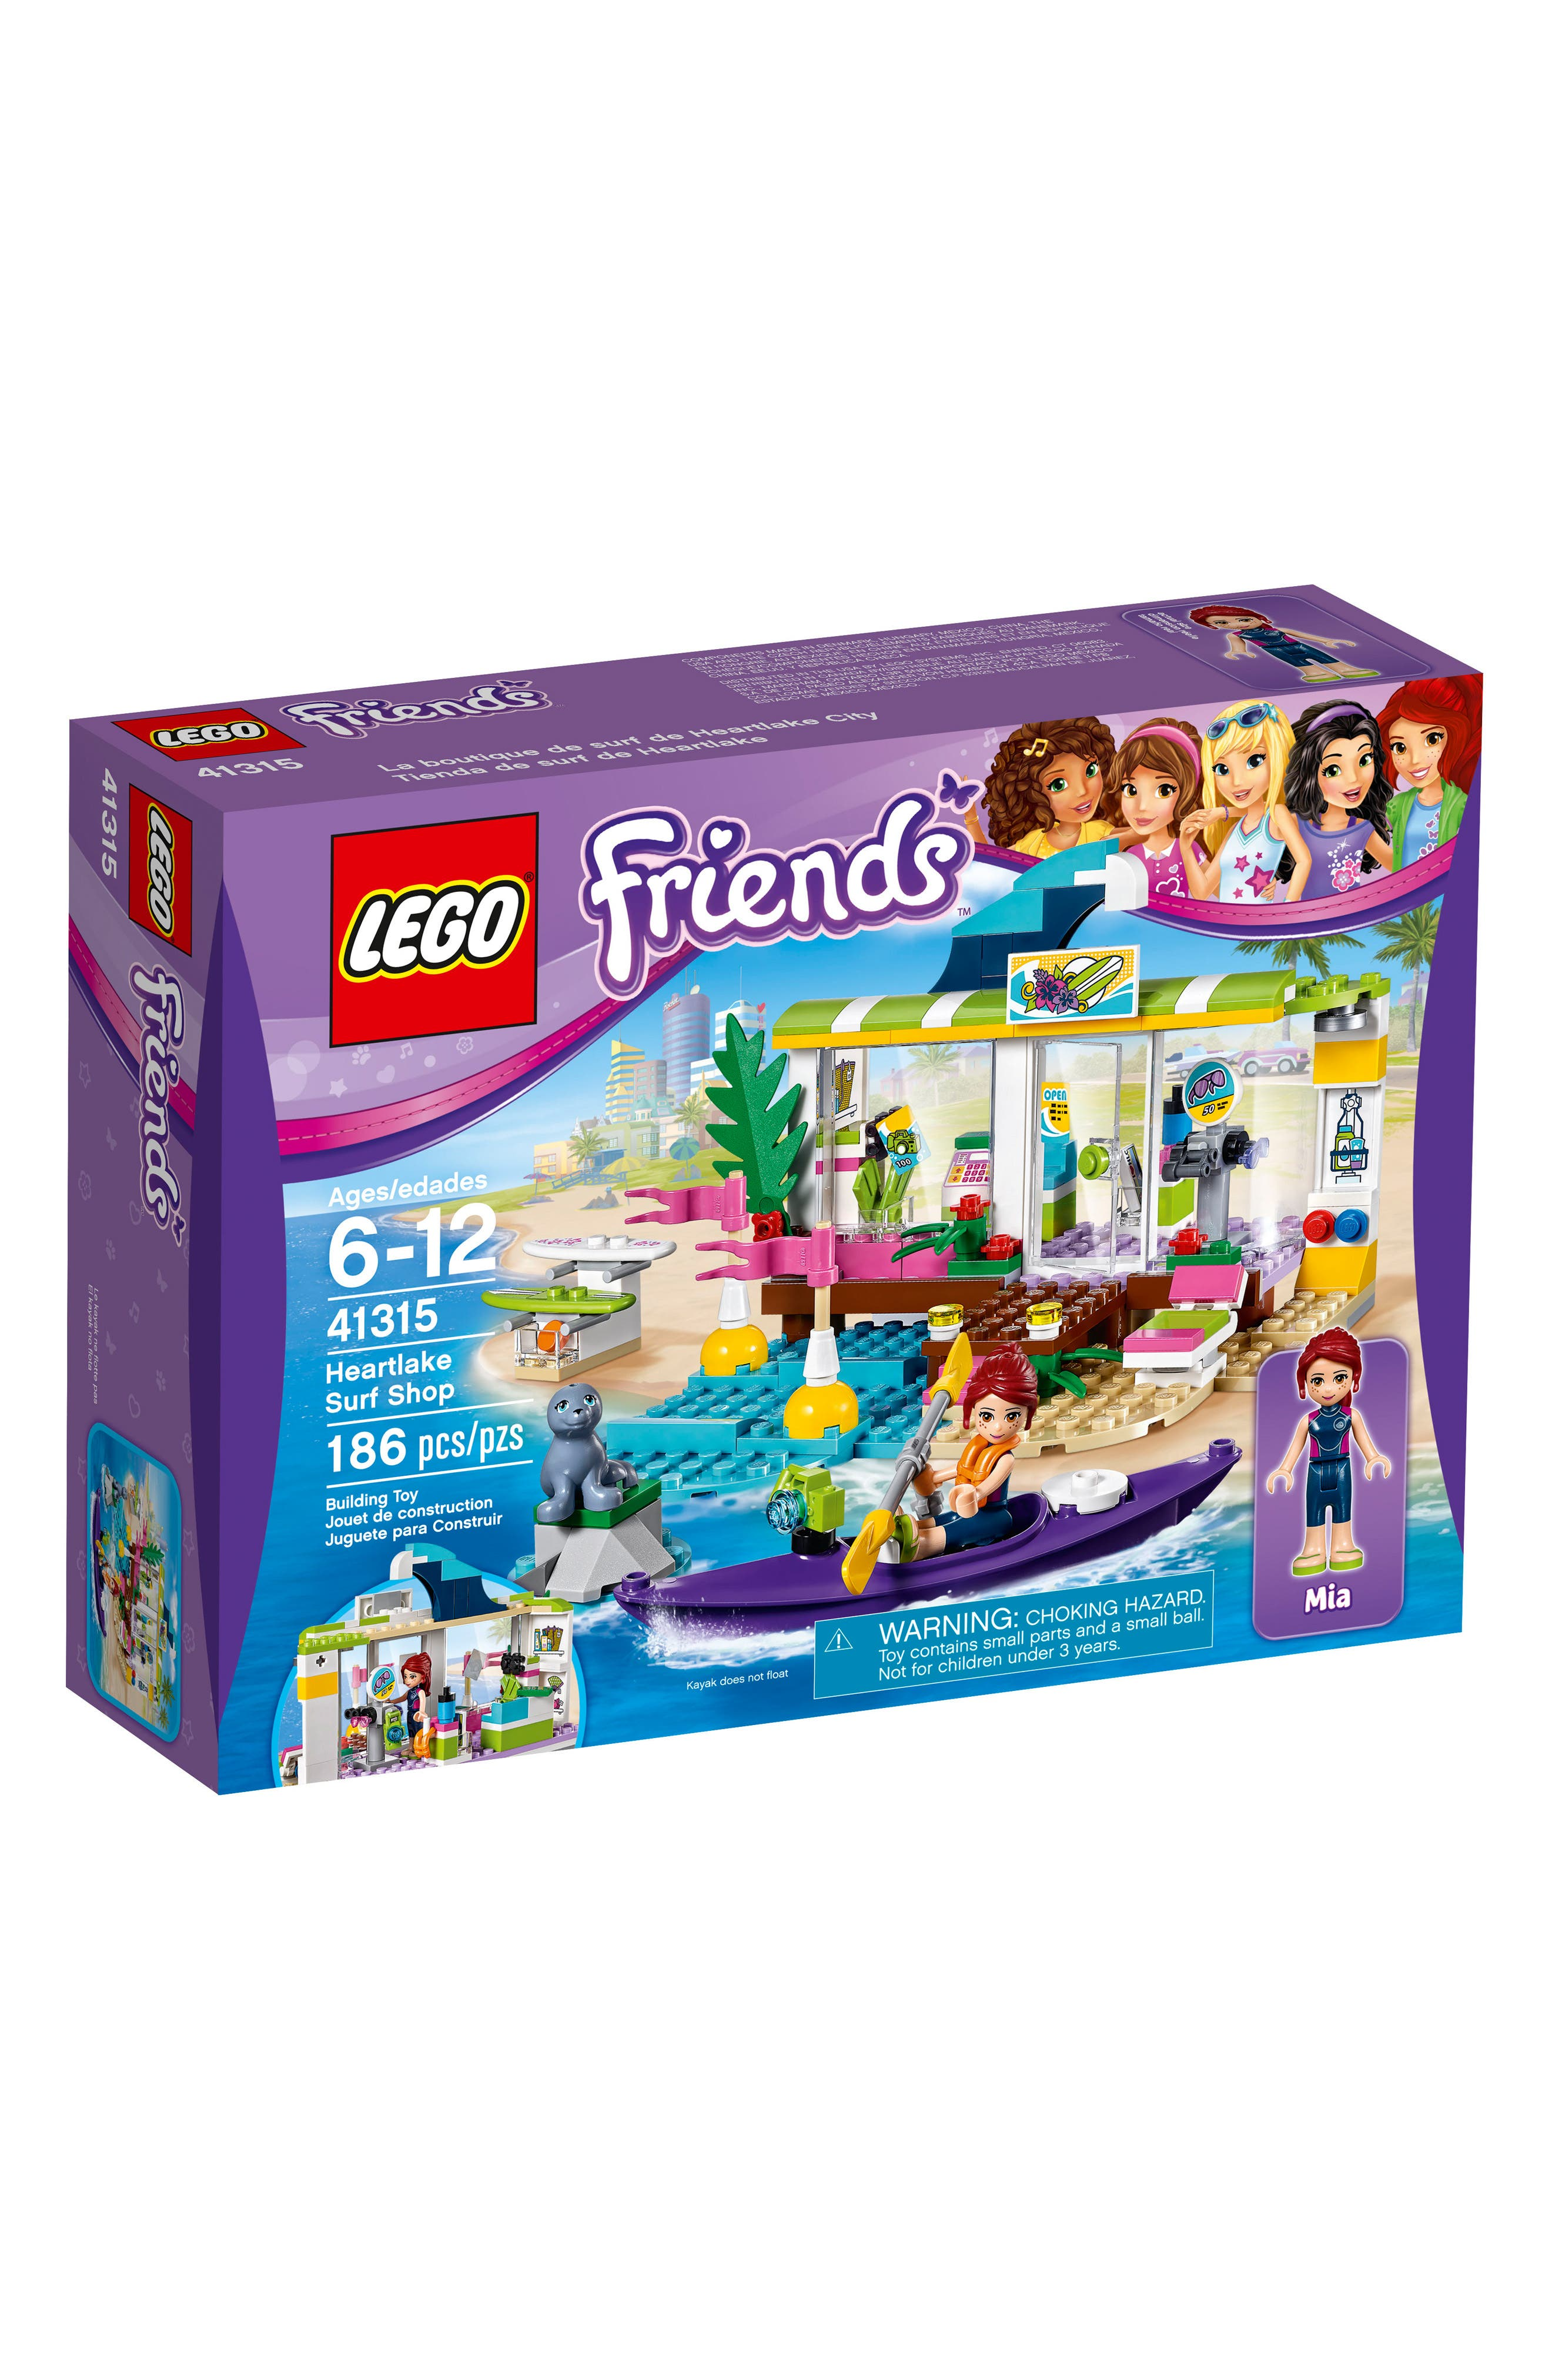 LEGO® Friends Heartlake Surf Shop Play Set - 41315